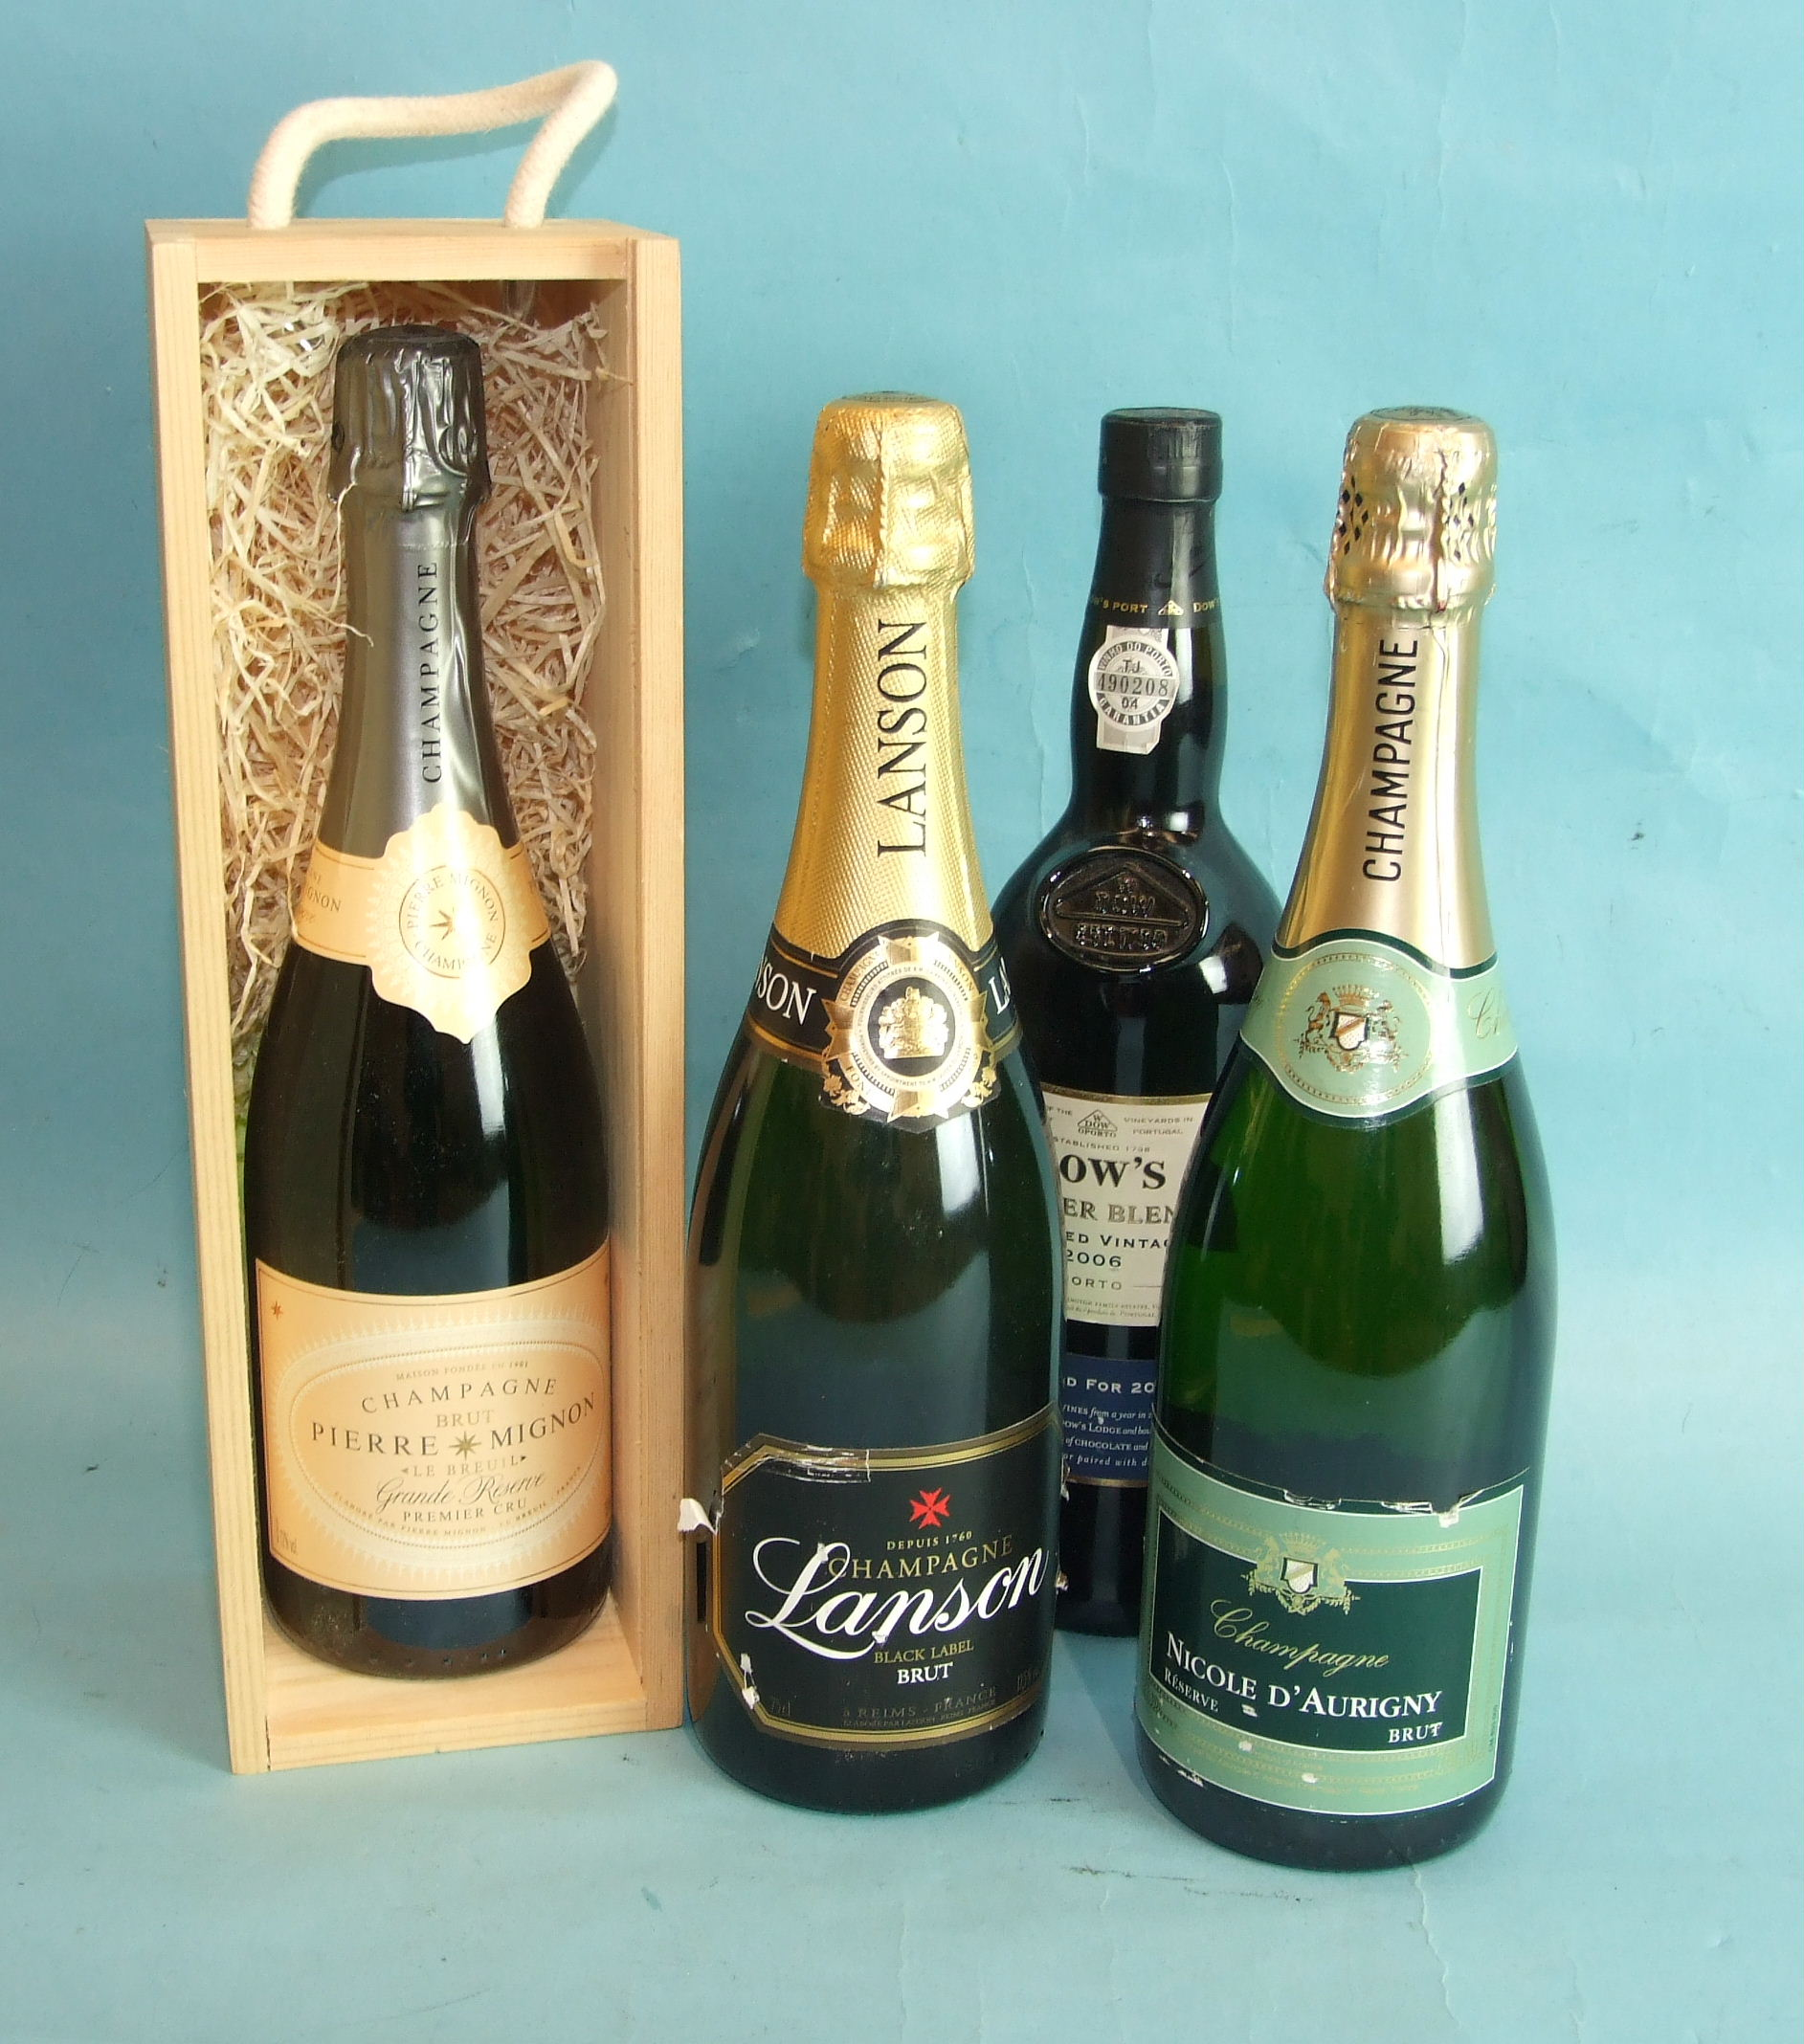 Lot 1 - Three botles of non-vintage Champagne: Lanson Black Label, Nicole D'Aurigny, Pierre Mignon (boxed)